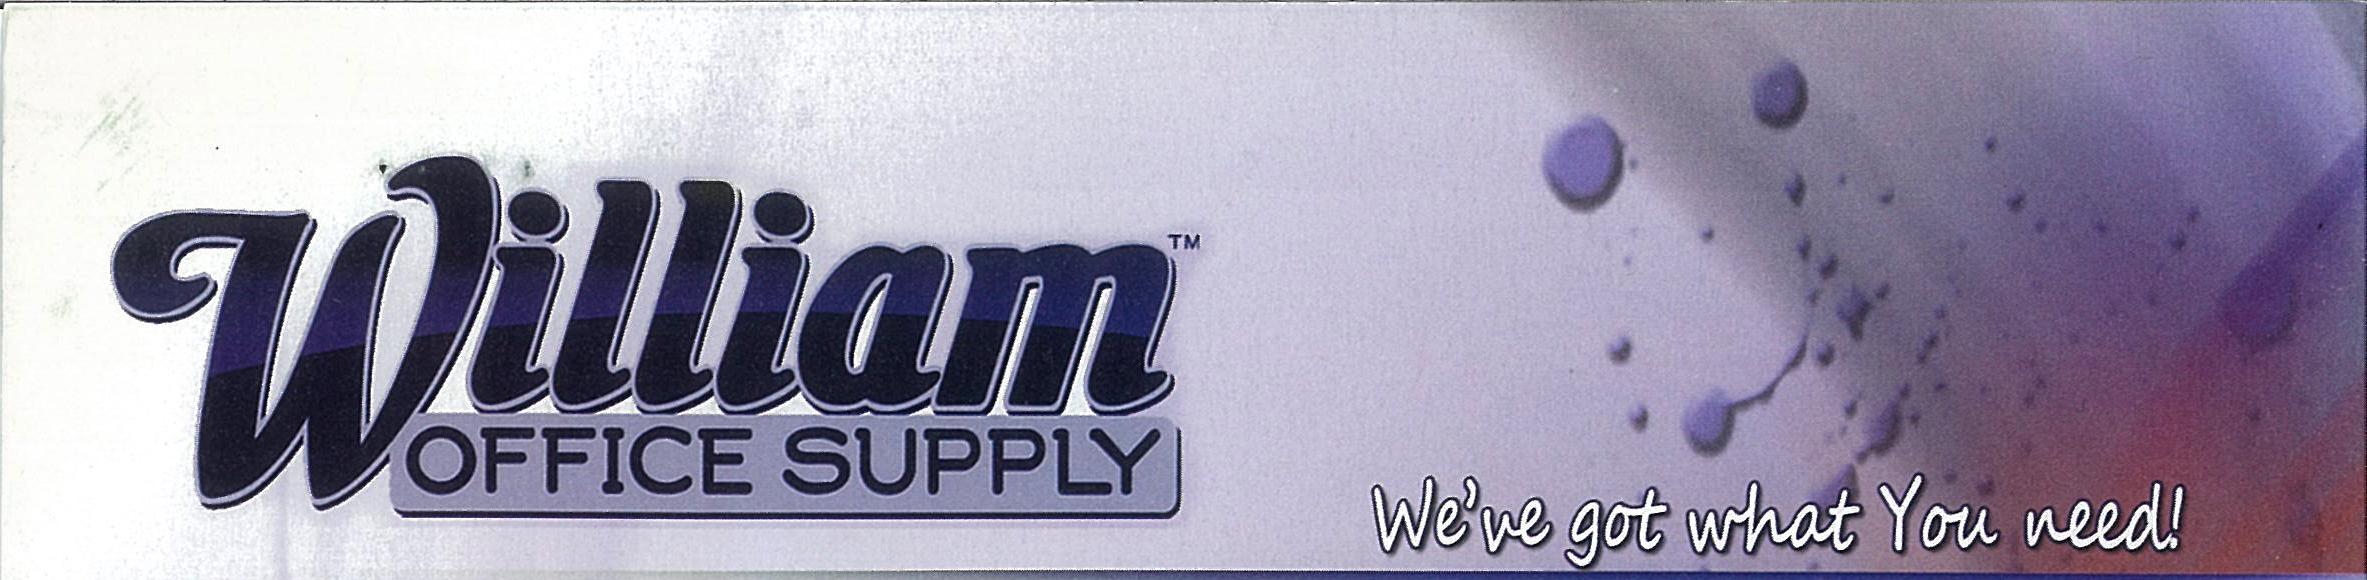 https://0201.nccdn.net/1_2/000/000/124/aae/william-office-supply-logo--1-.jpg